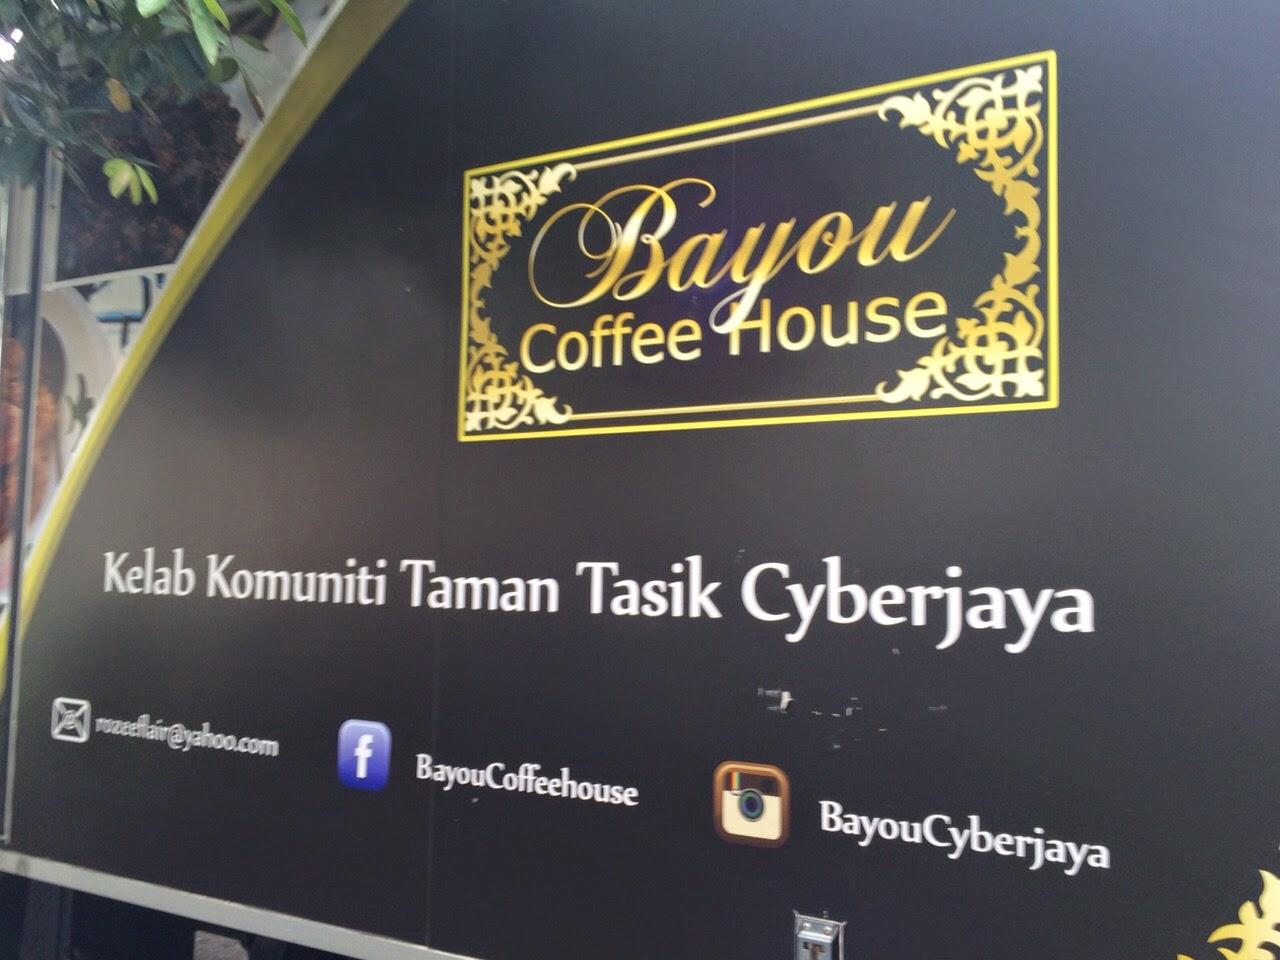 SELERA KAMPUNG DI BAYOU COFFEE HOUSE